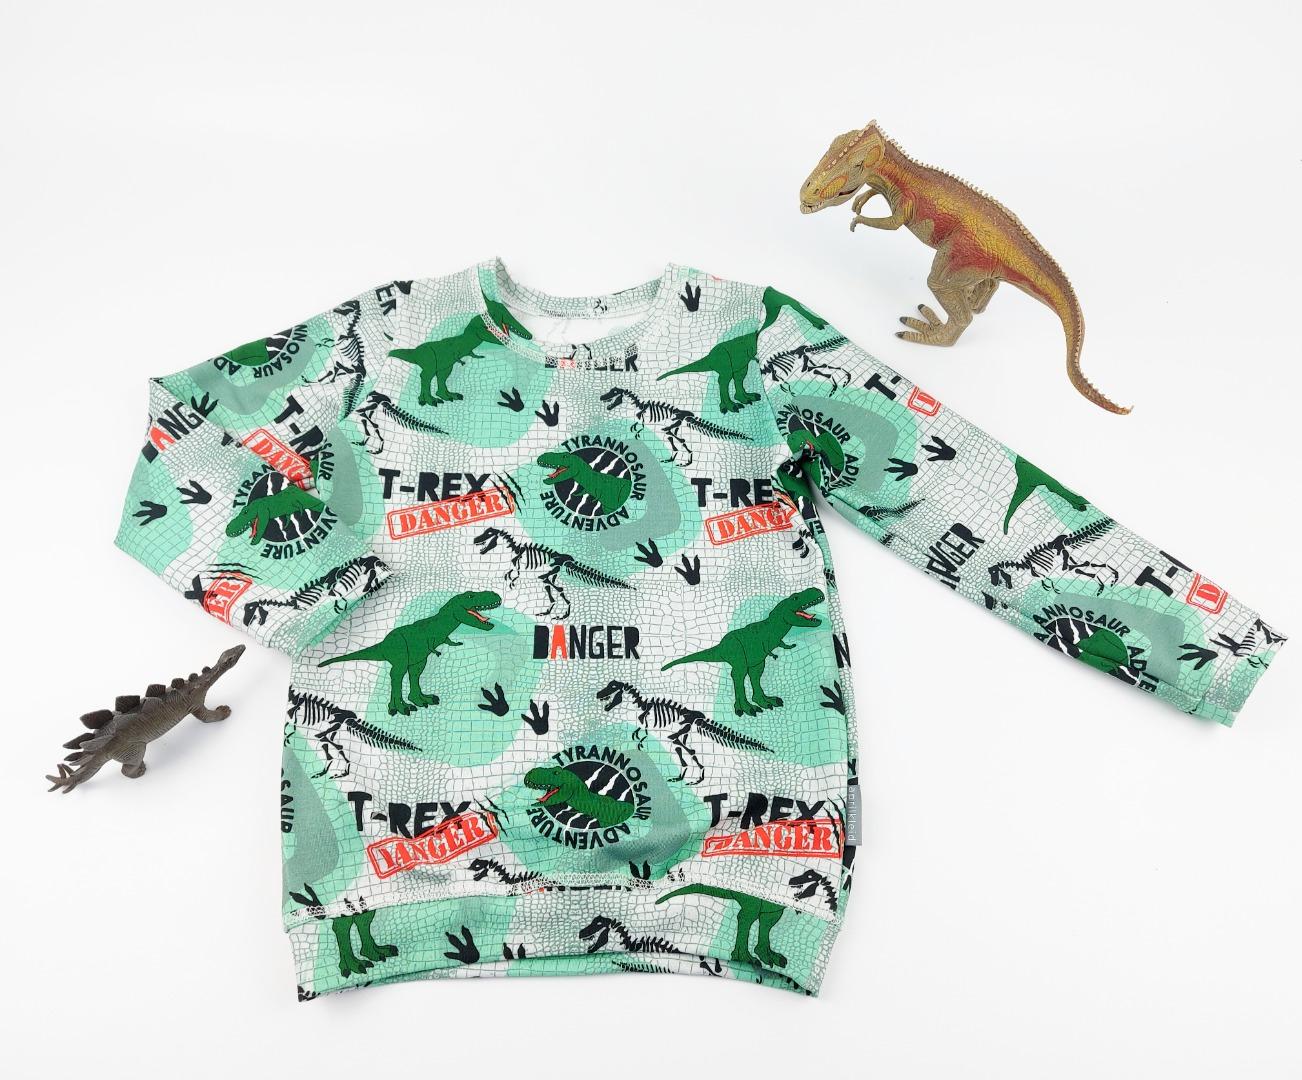 Sofortkauf Handmade Sweatshirt Gr 110